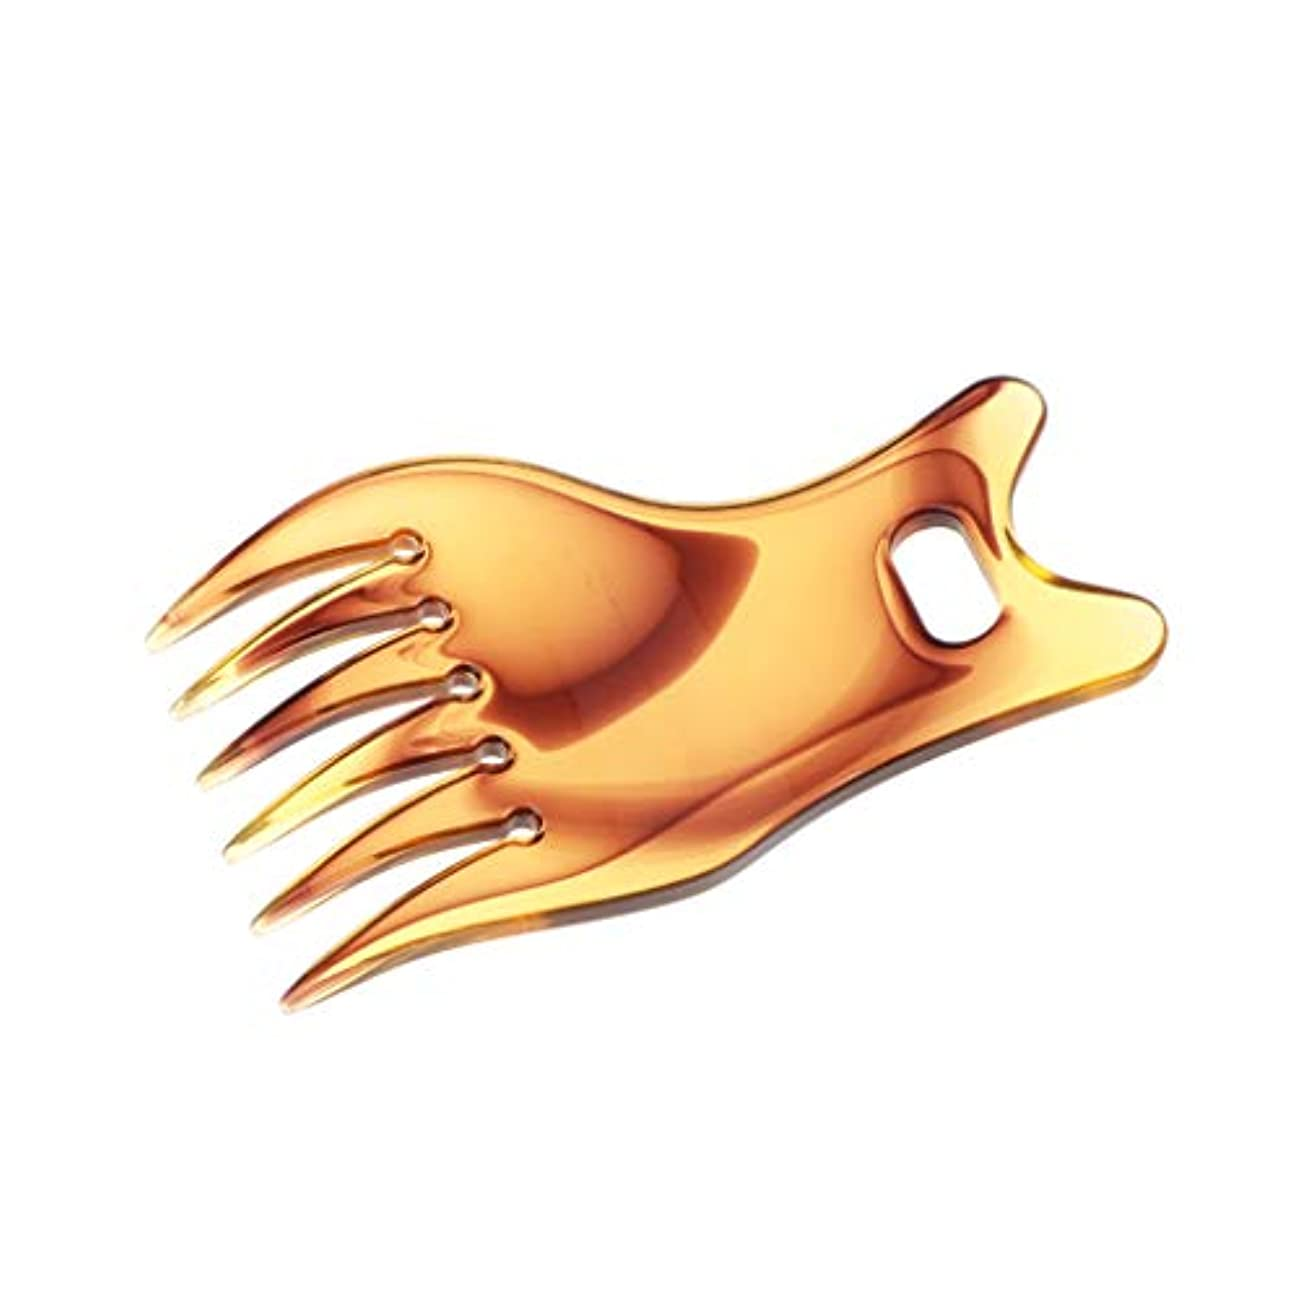 T TOOYFUL ヘアコーム ピックコーム 広い歯 サロン 理容 染料 理髪 ヘアスタイリング 帯電防止 耐熱性 - 褐色